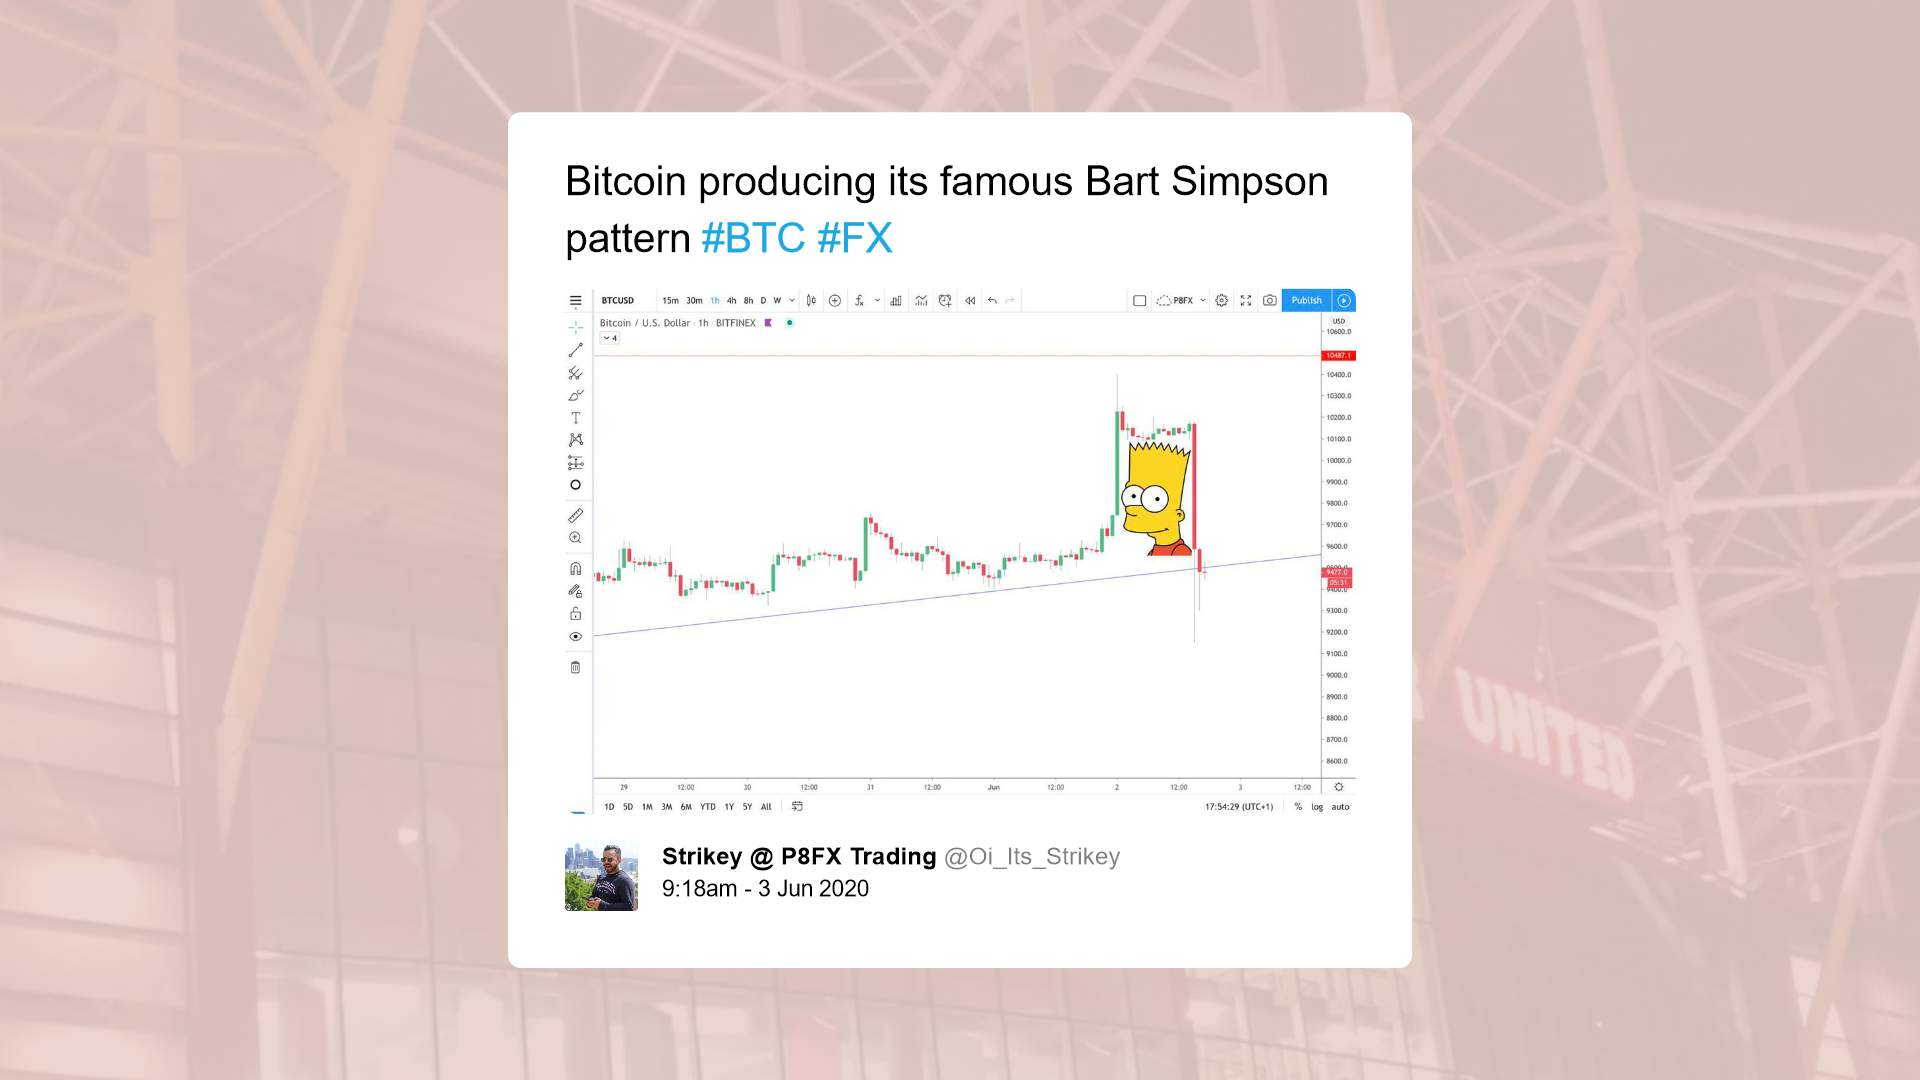 Bitcoin's bart pattern suggesting manipulation